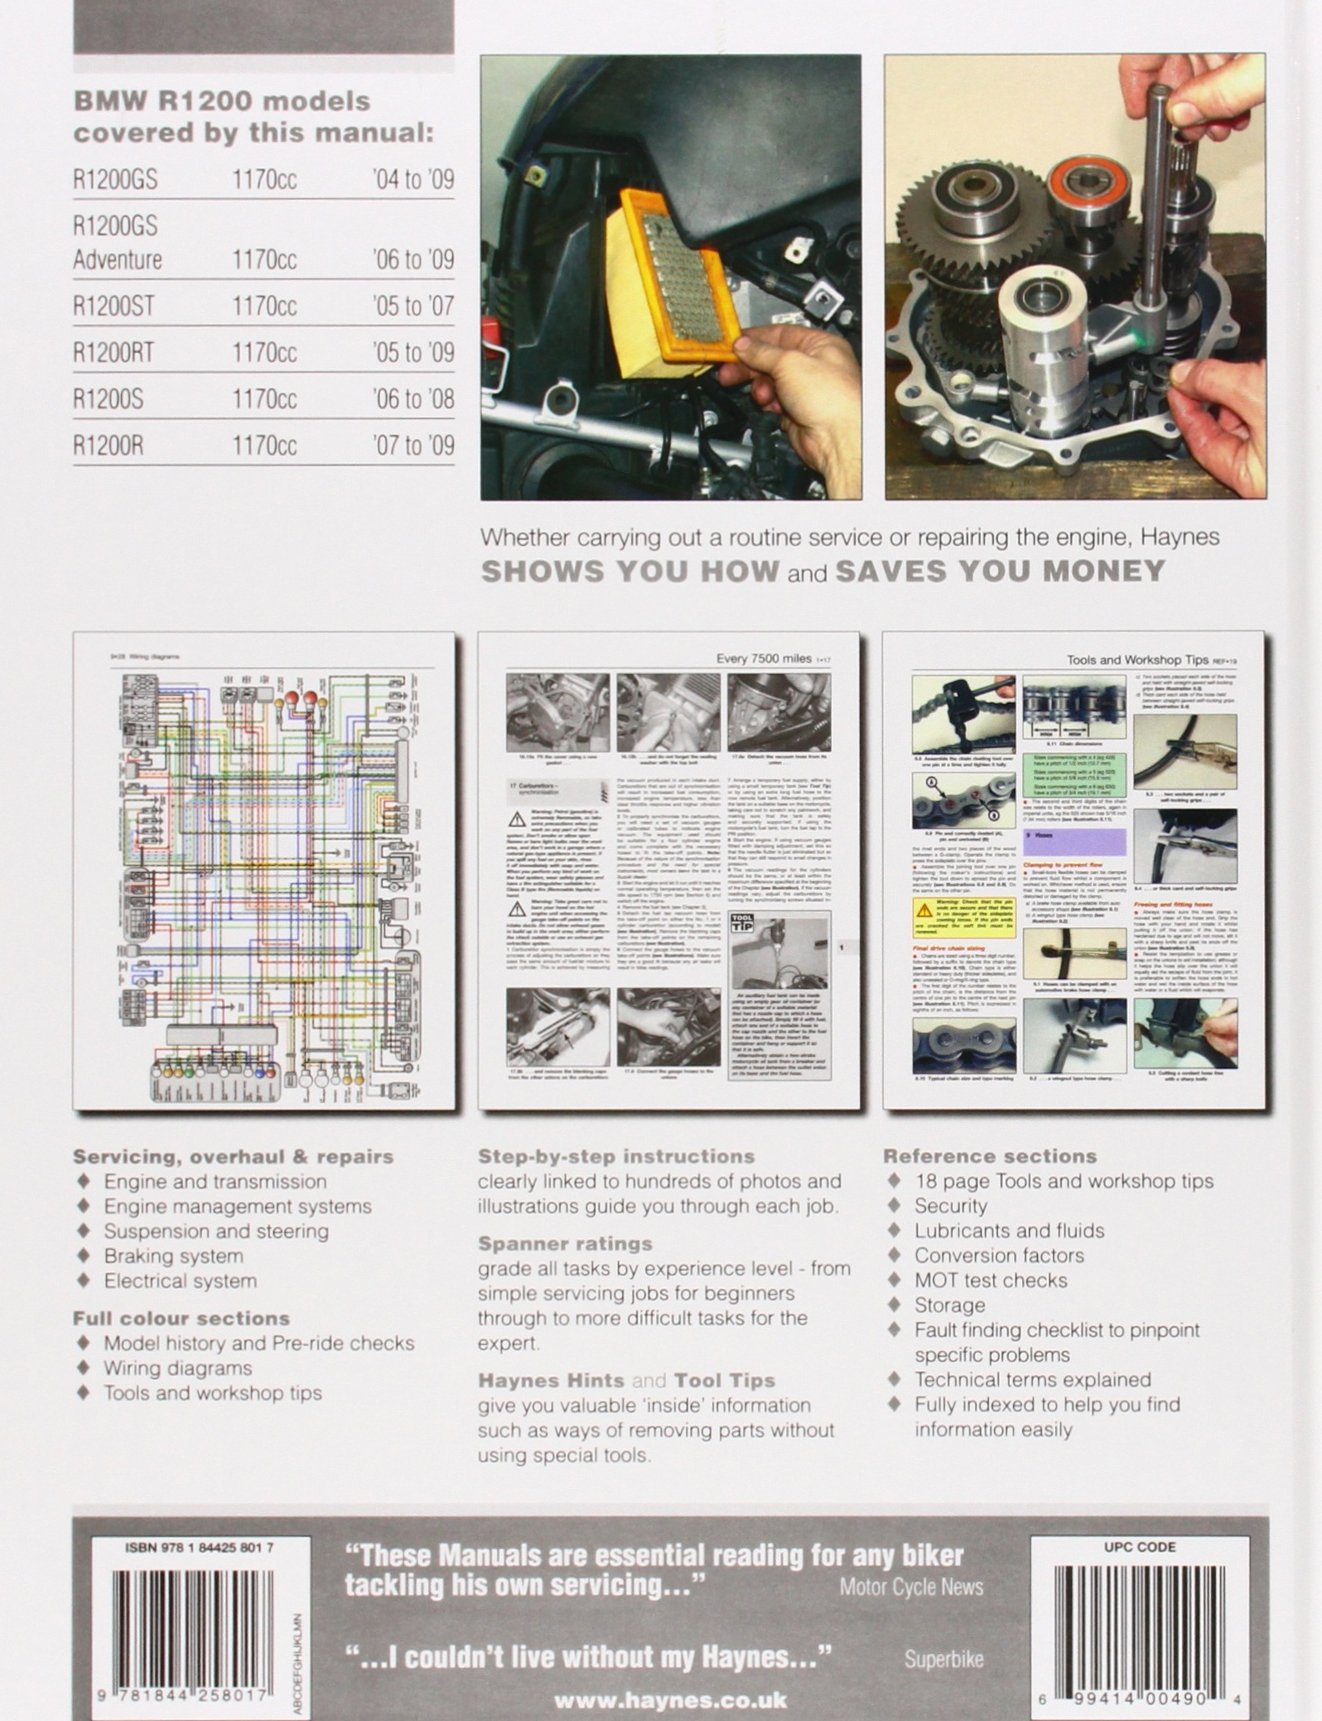 Bmw R1200 Service And Repair Manual 2004 To 2009 Haynes Wiring Diagram Key Manuals Phil Mather 9781844258017